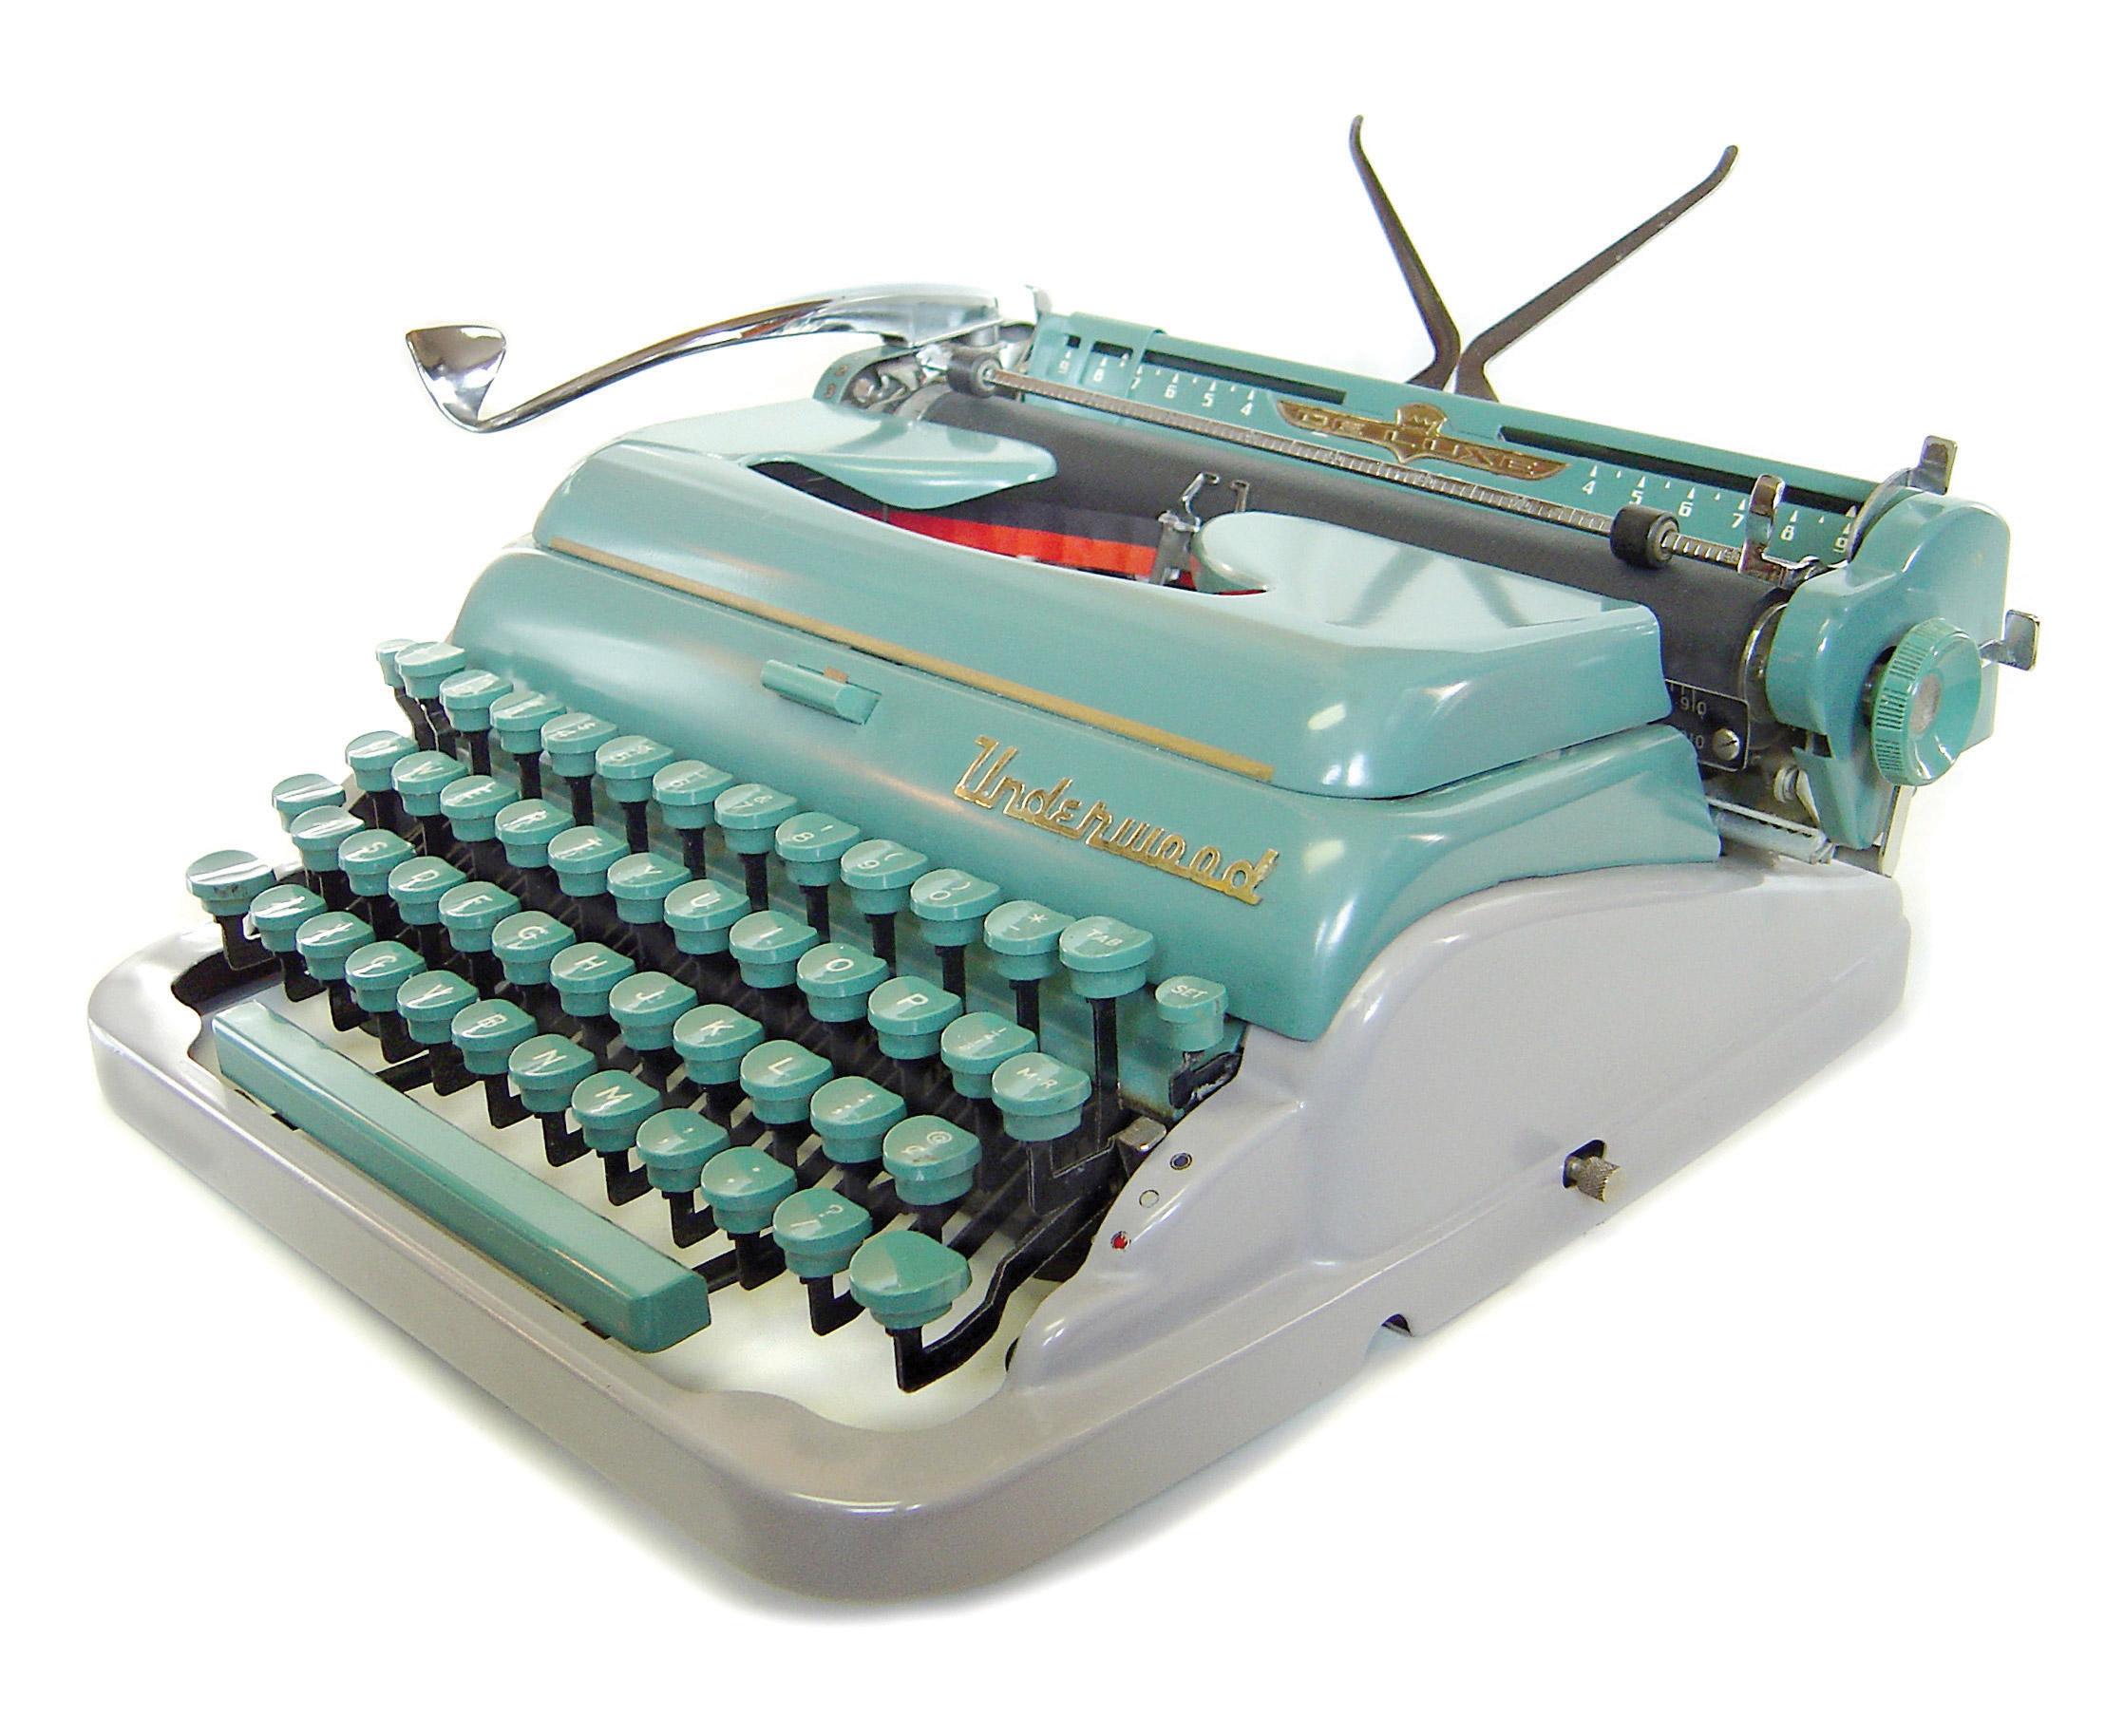 The mid-century Underwood Deluxe Quiet Tab. 1956.